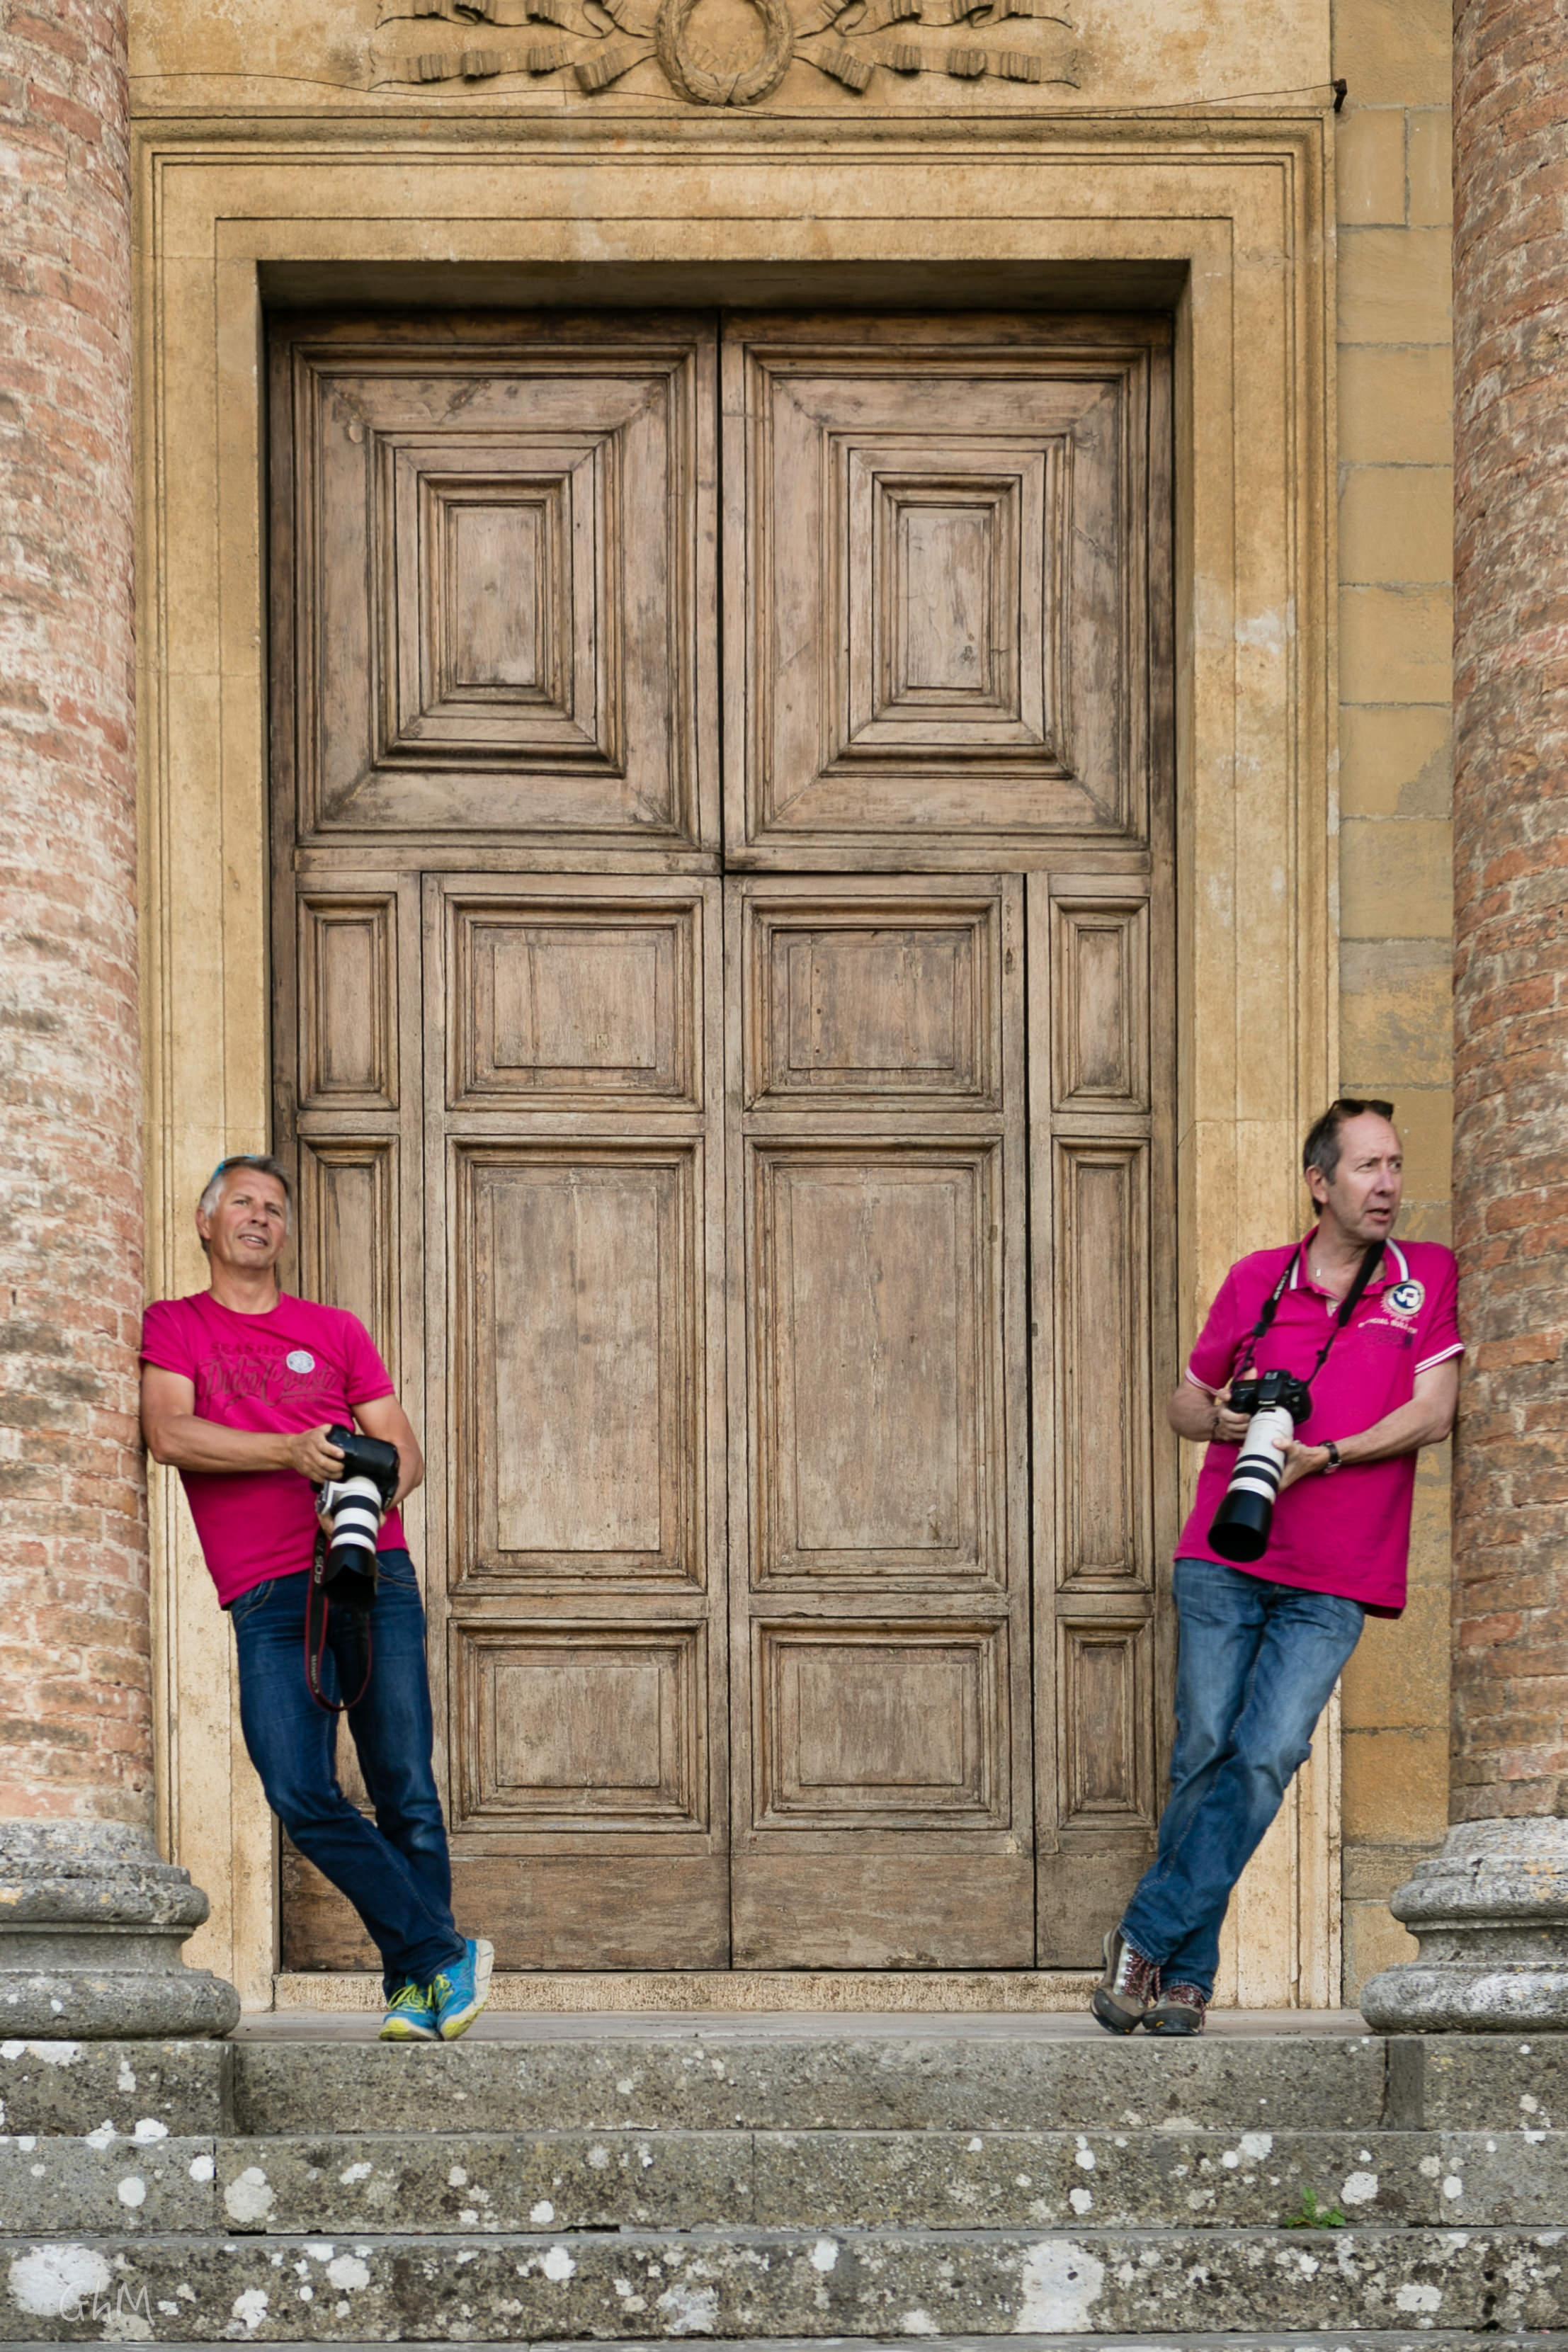 08102015-Toscane-1142.jpg